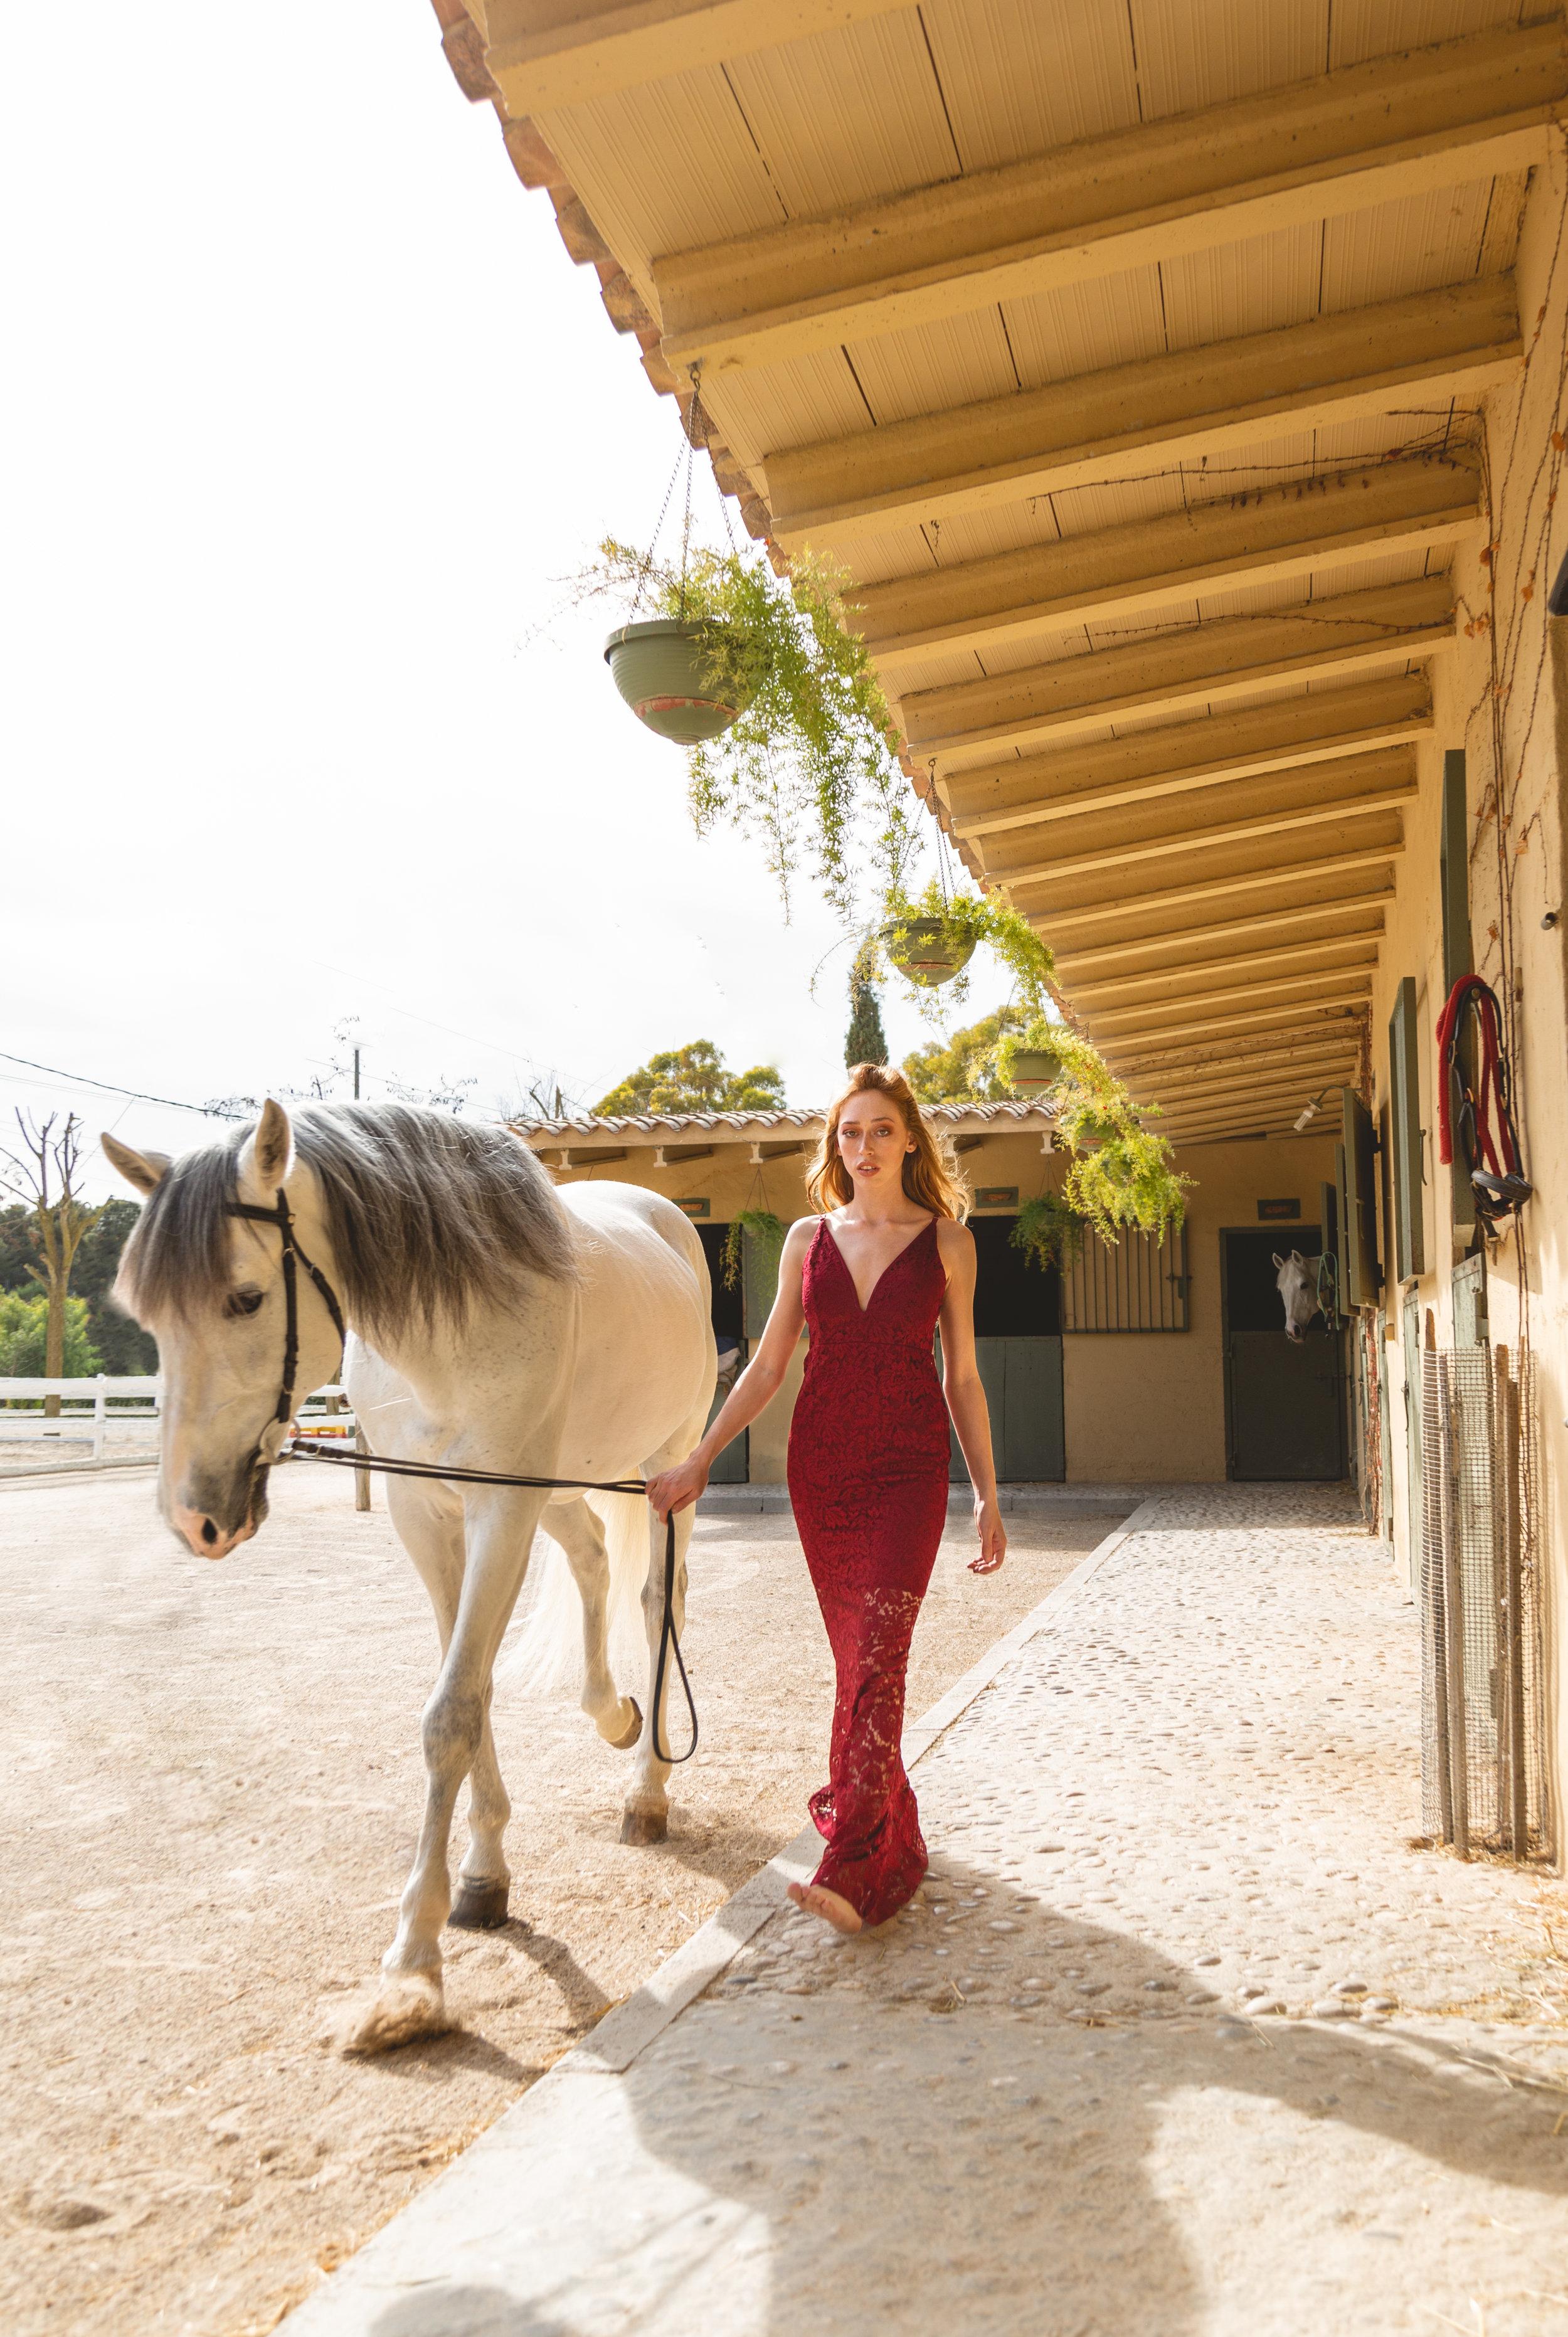 Helene_HorseEditorial_2019_2-2.JPG